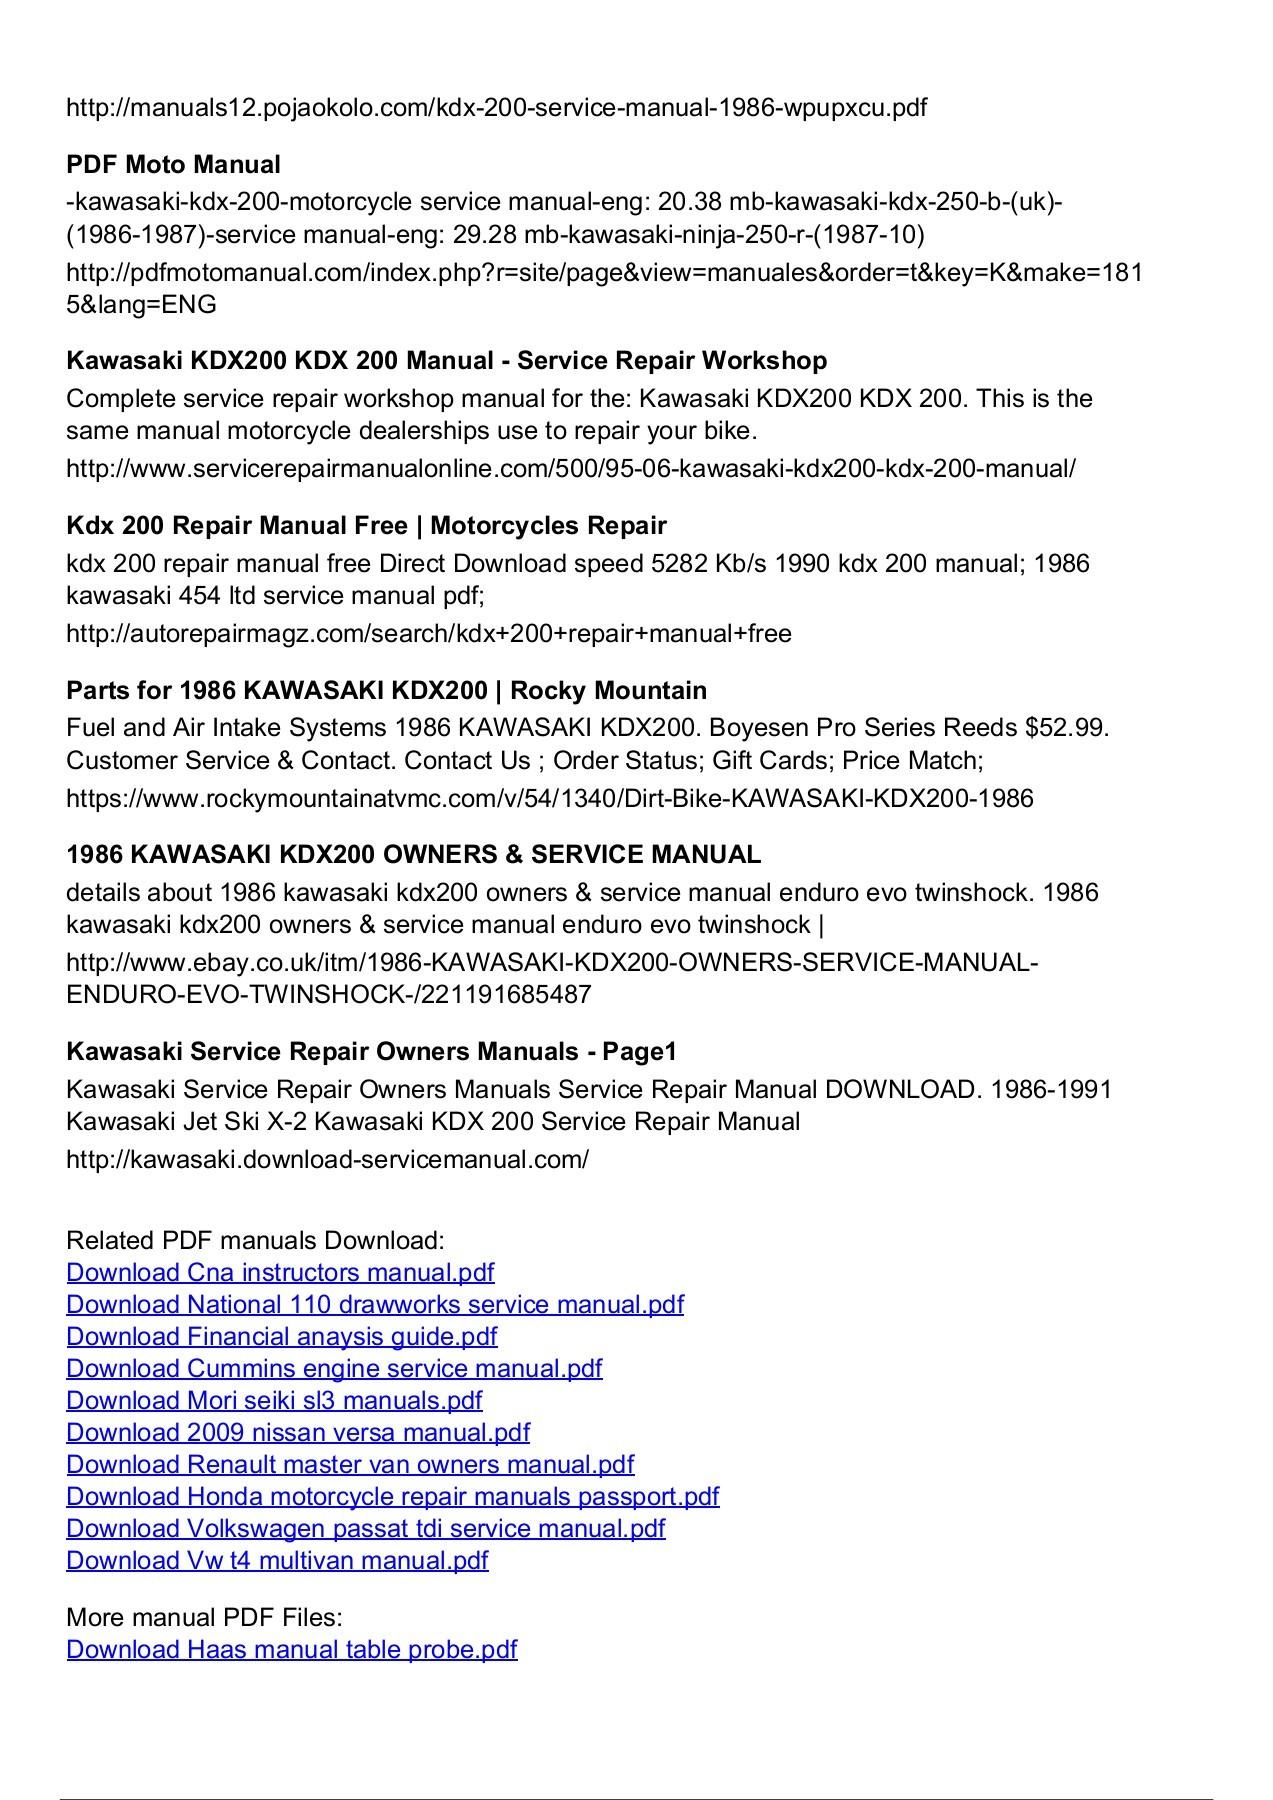 Kawasaki Engine Manual Ebook Lincoln Sa 200 Service Array Piaggio Mp3 125 Repair Download Rh